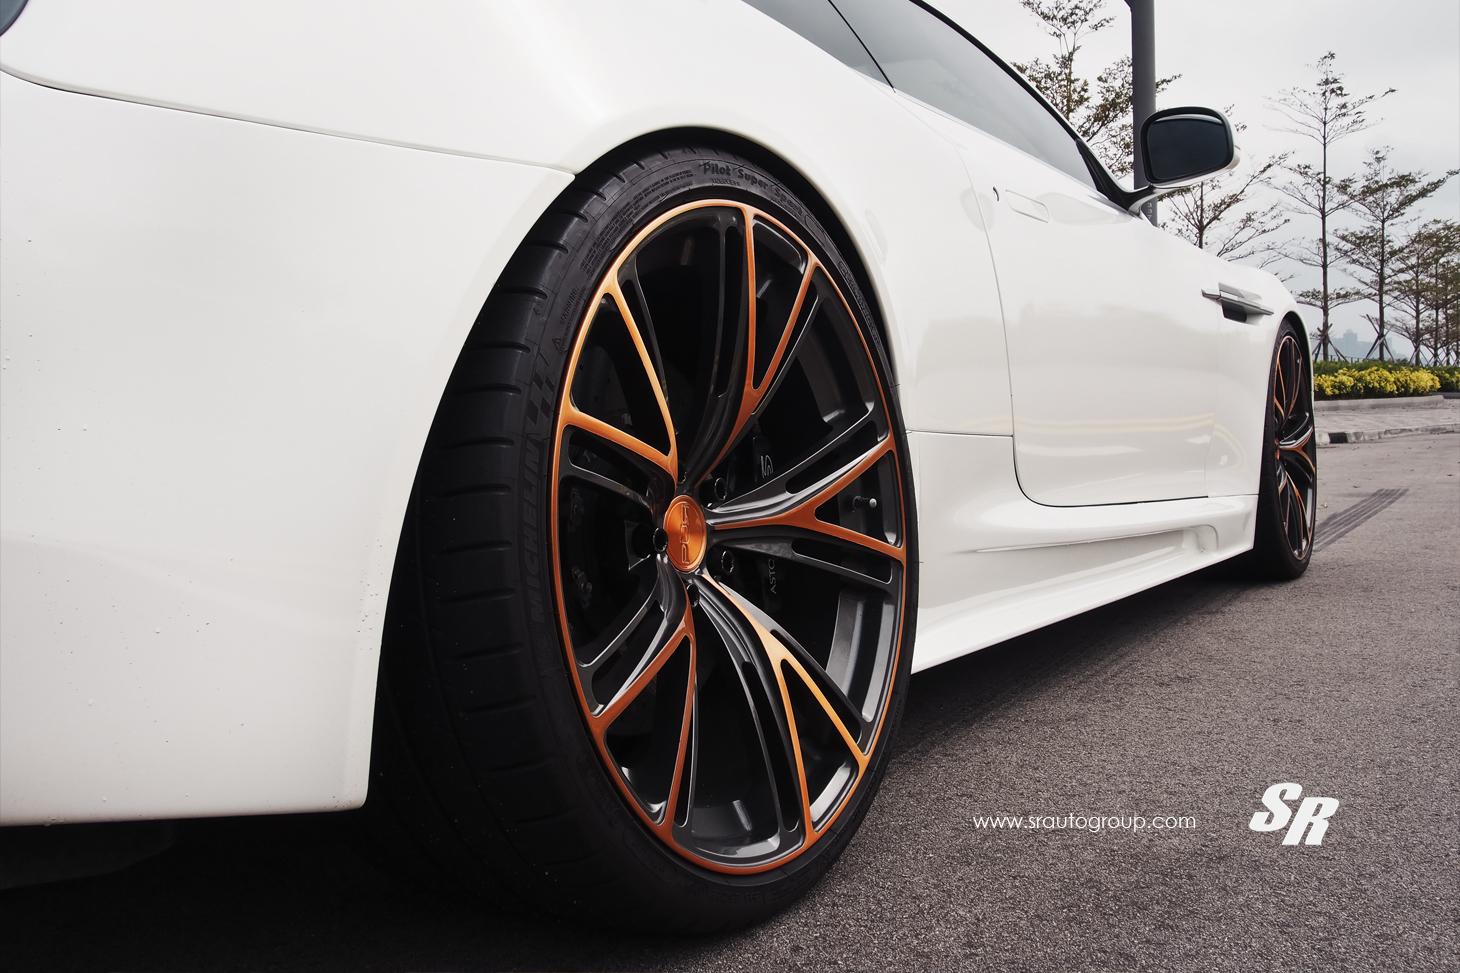 Aston Martin Dbs On Rose Gold Wheels Transformers 4 Eye